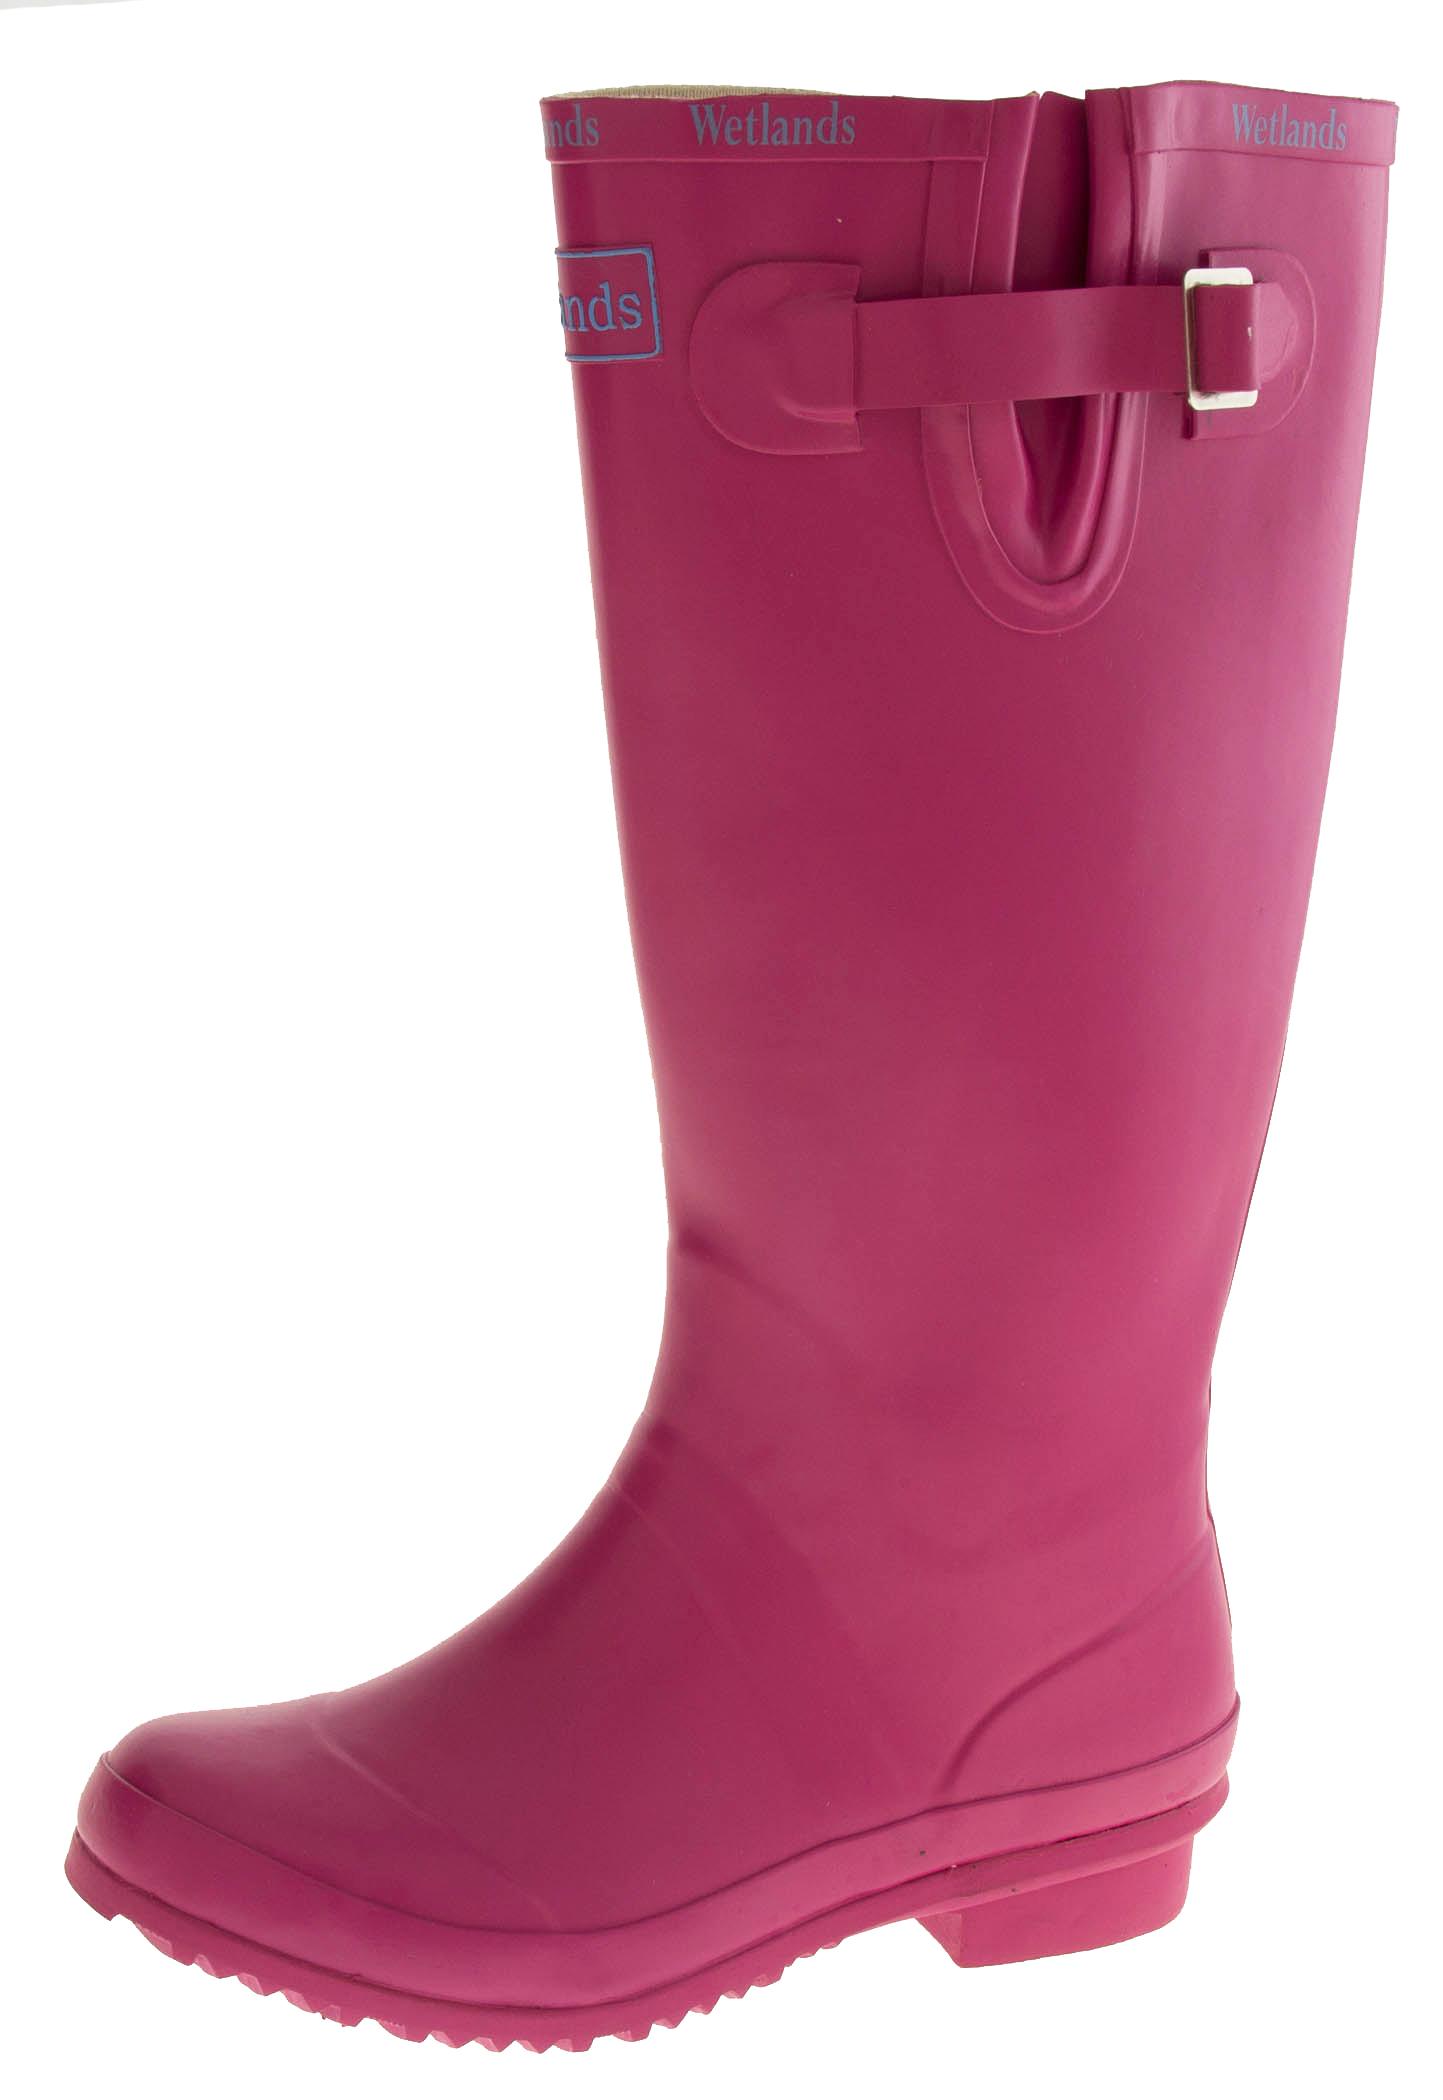 WOMEN/'S WETLANDS STRIPED RAIN FESTIVAL CALF WELLIES LADIES NEW WELLINGTON BOOTS